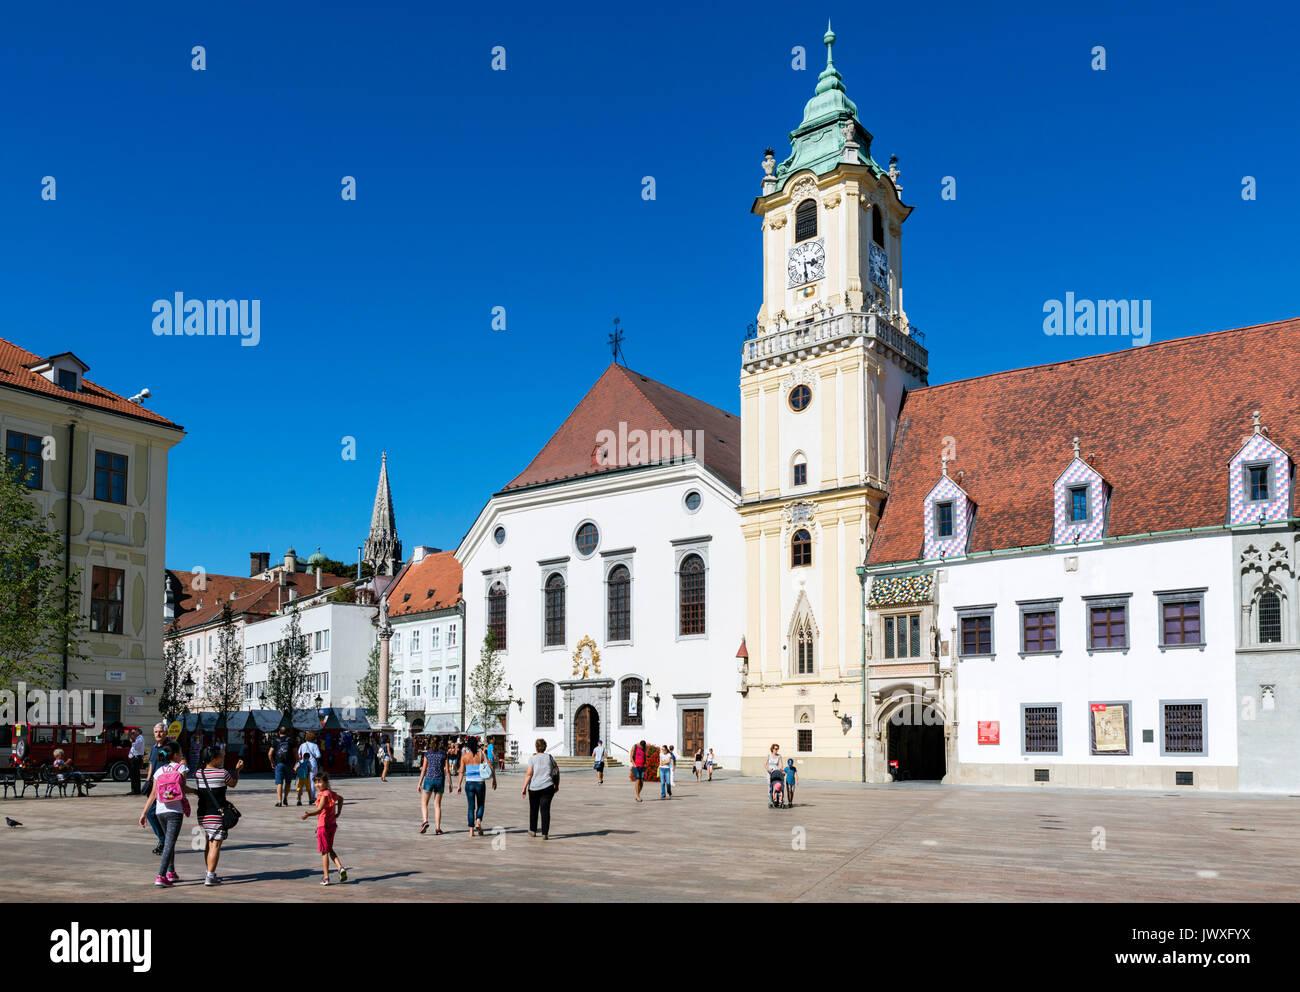 Holy Saviour Church (Jesuit Church) and Old Town Hall on Hlavné námestie (Main Square), Old Town, Bratislava, Slovakia - Stock Image